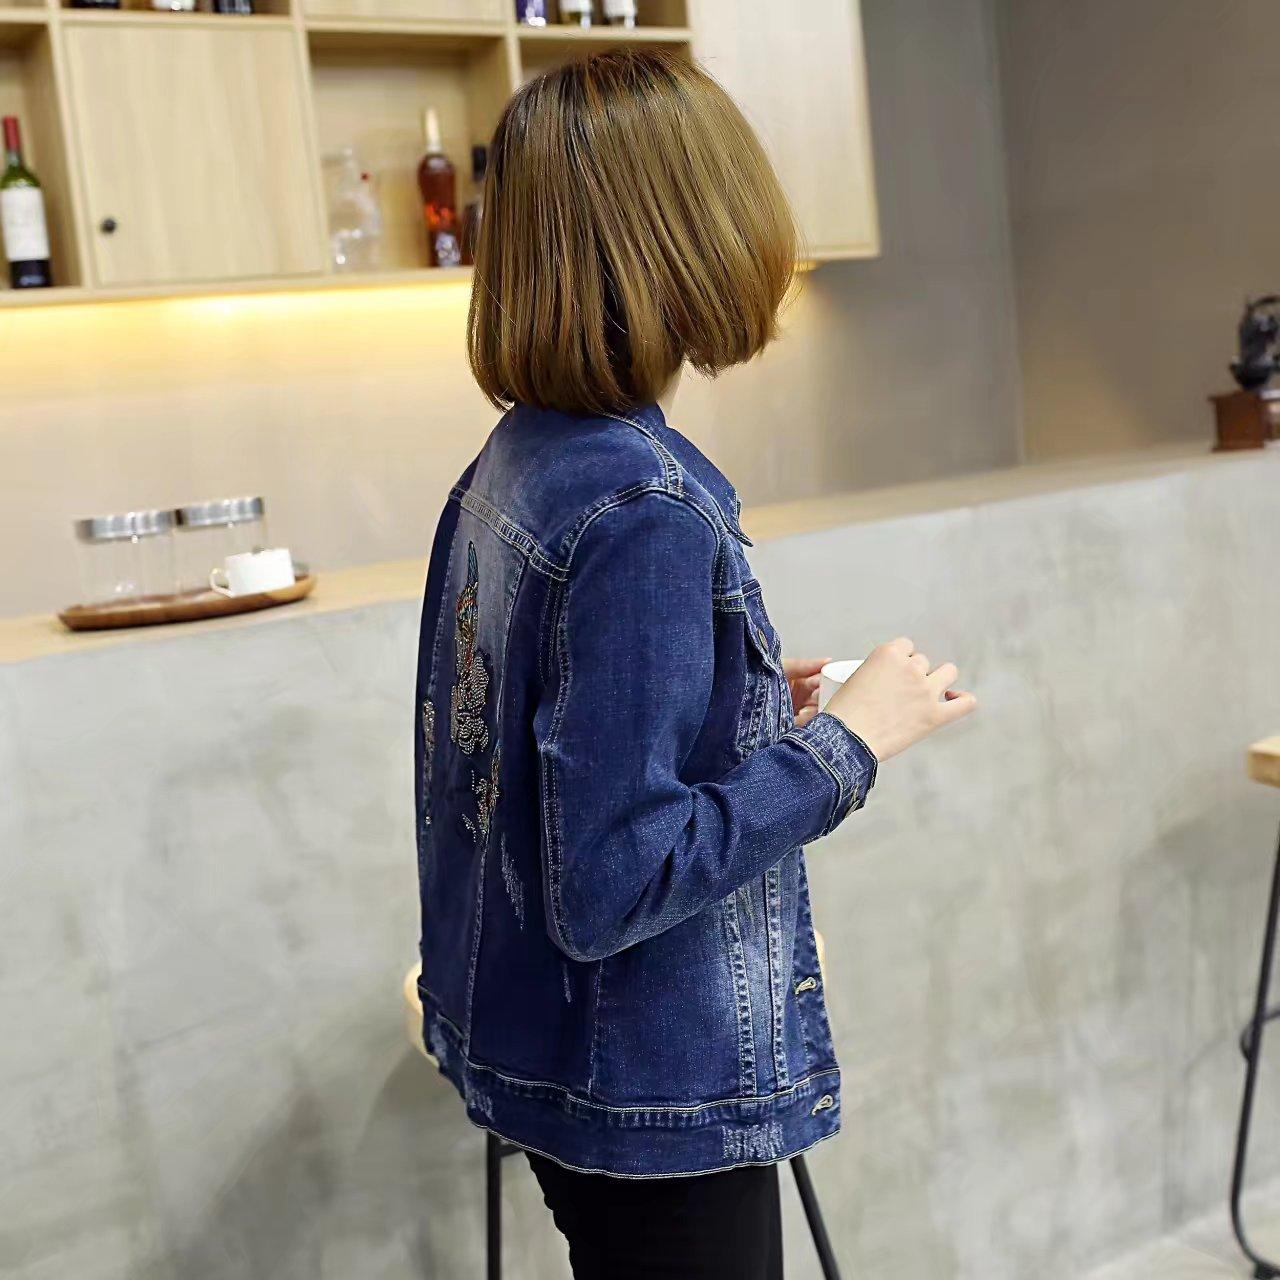 Embroidery Denim Jackets Women Coats Plus Size 3 4 XL Single Breasted Regular Jackets Blue KKFY929 1